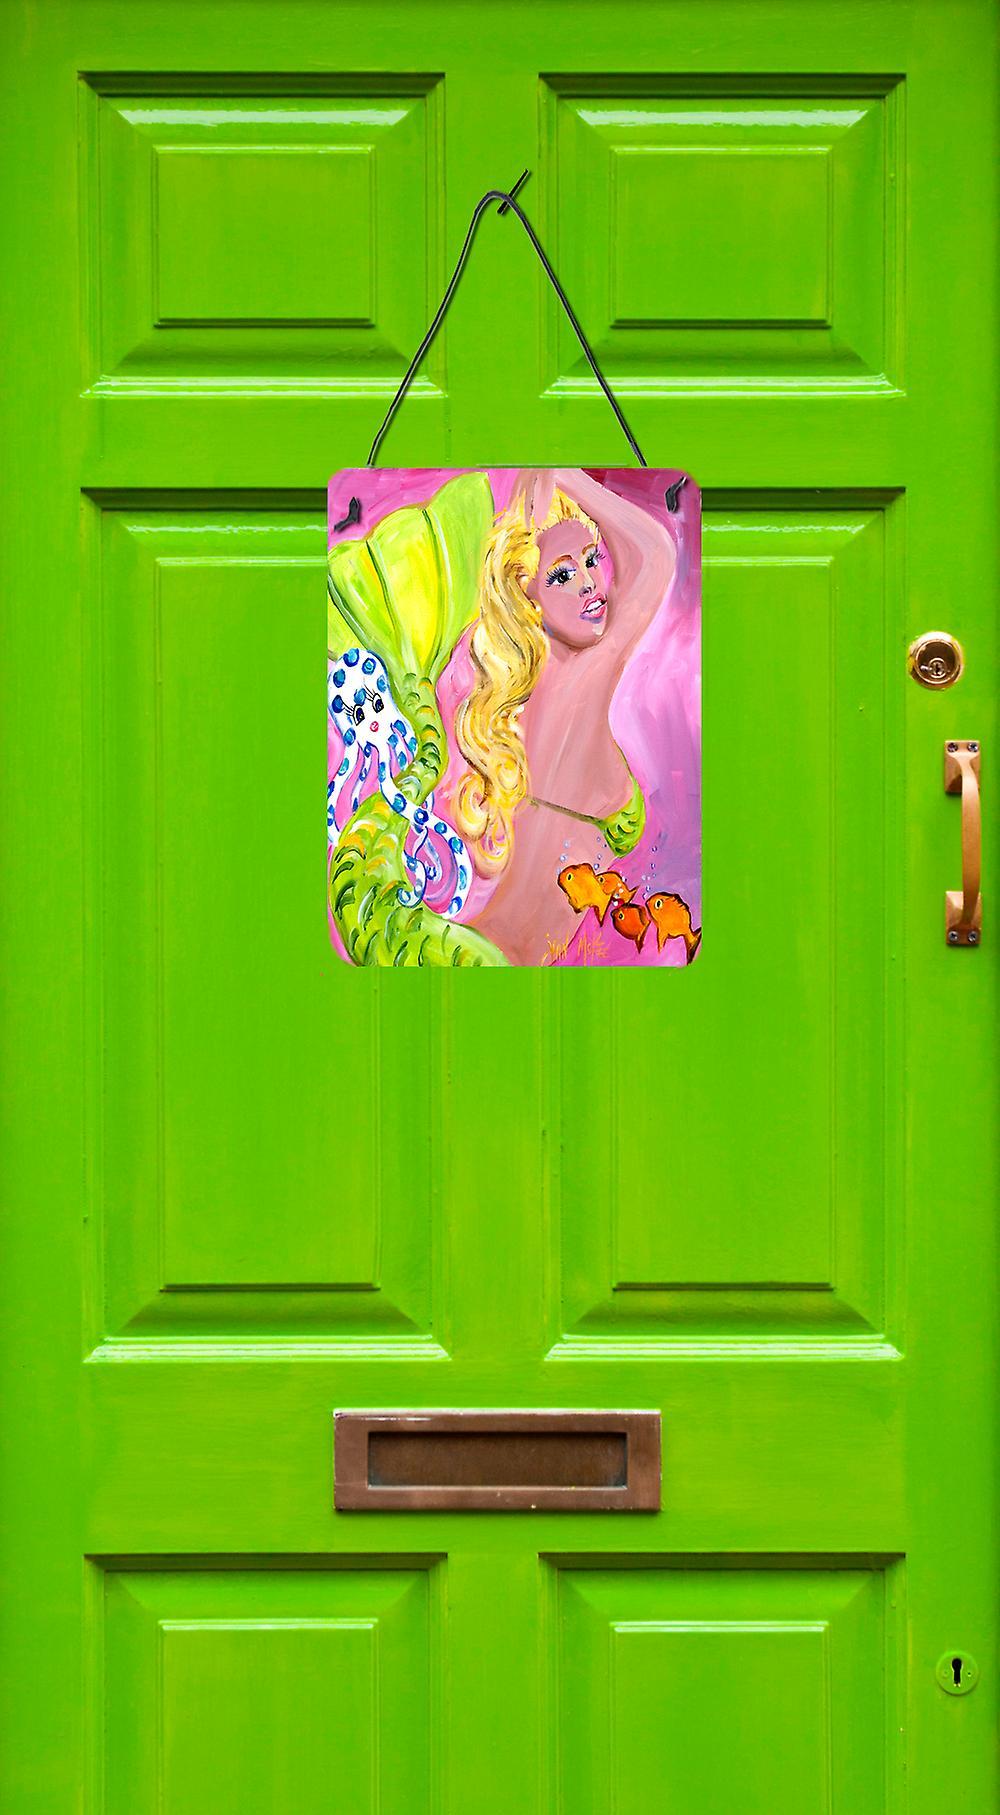 Carolines Treasures  JMK1183DS1216 Pink Mermaid Wall or Door Hanging Prints